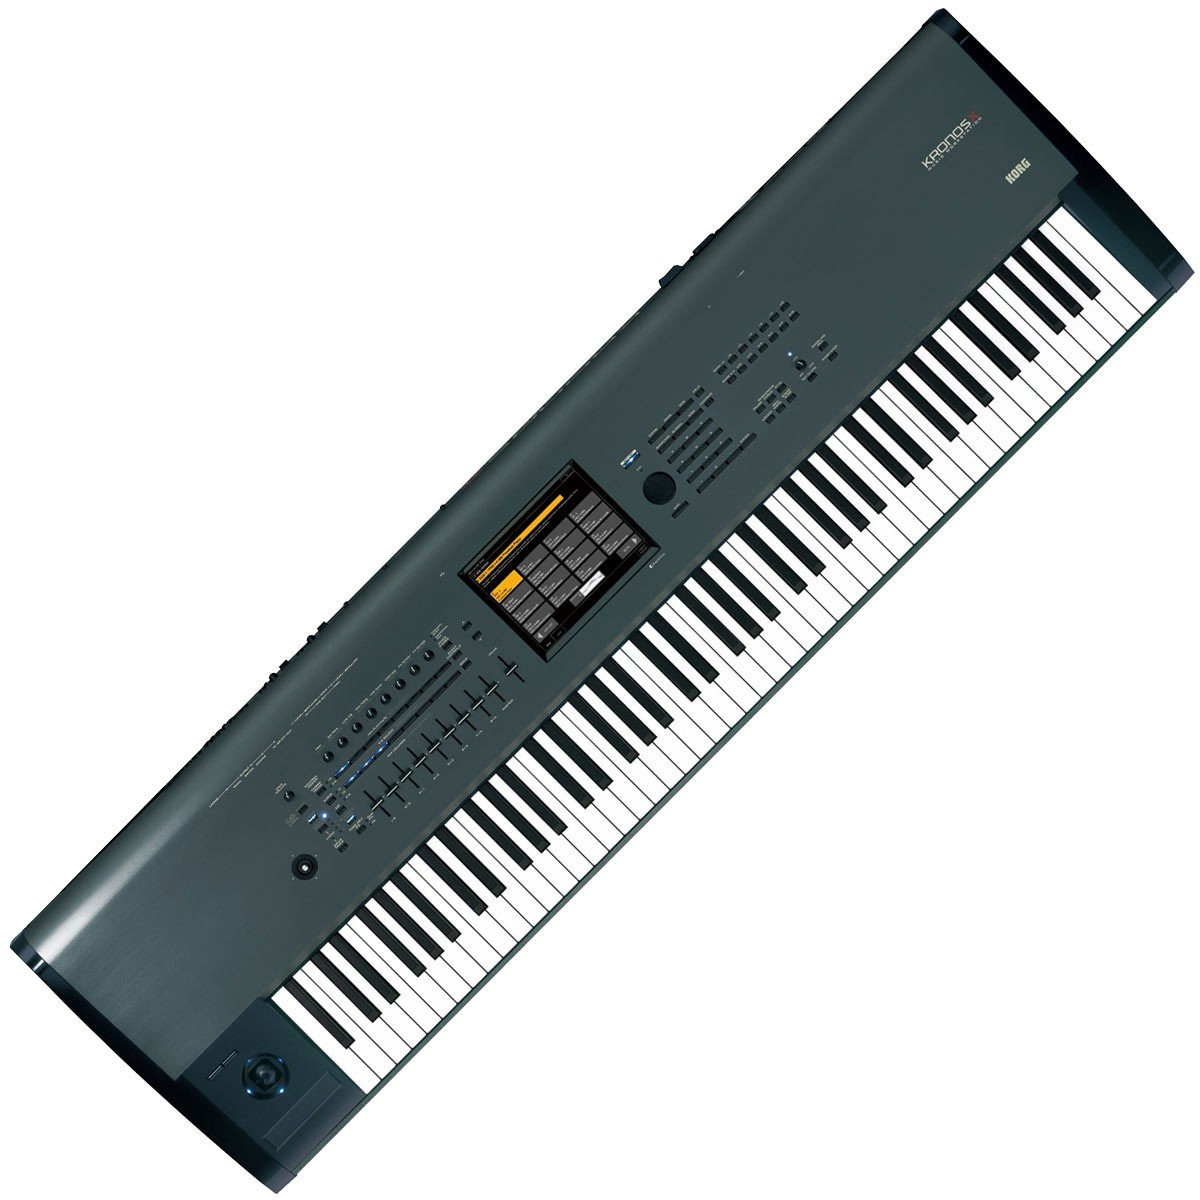 korg kronos x88 x 88 weighted key synthesizer workstation keyboard ebay. Black Bedroom Furniture Sets. Home Design Ideas